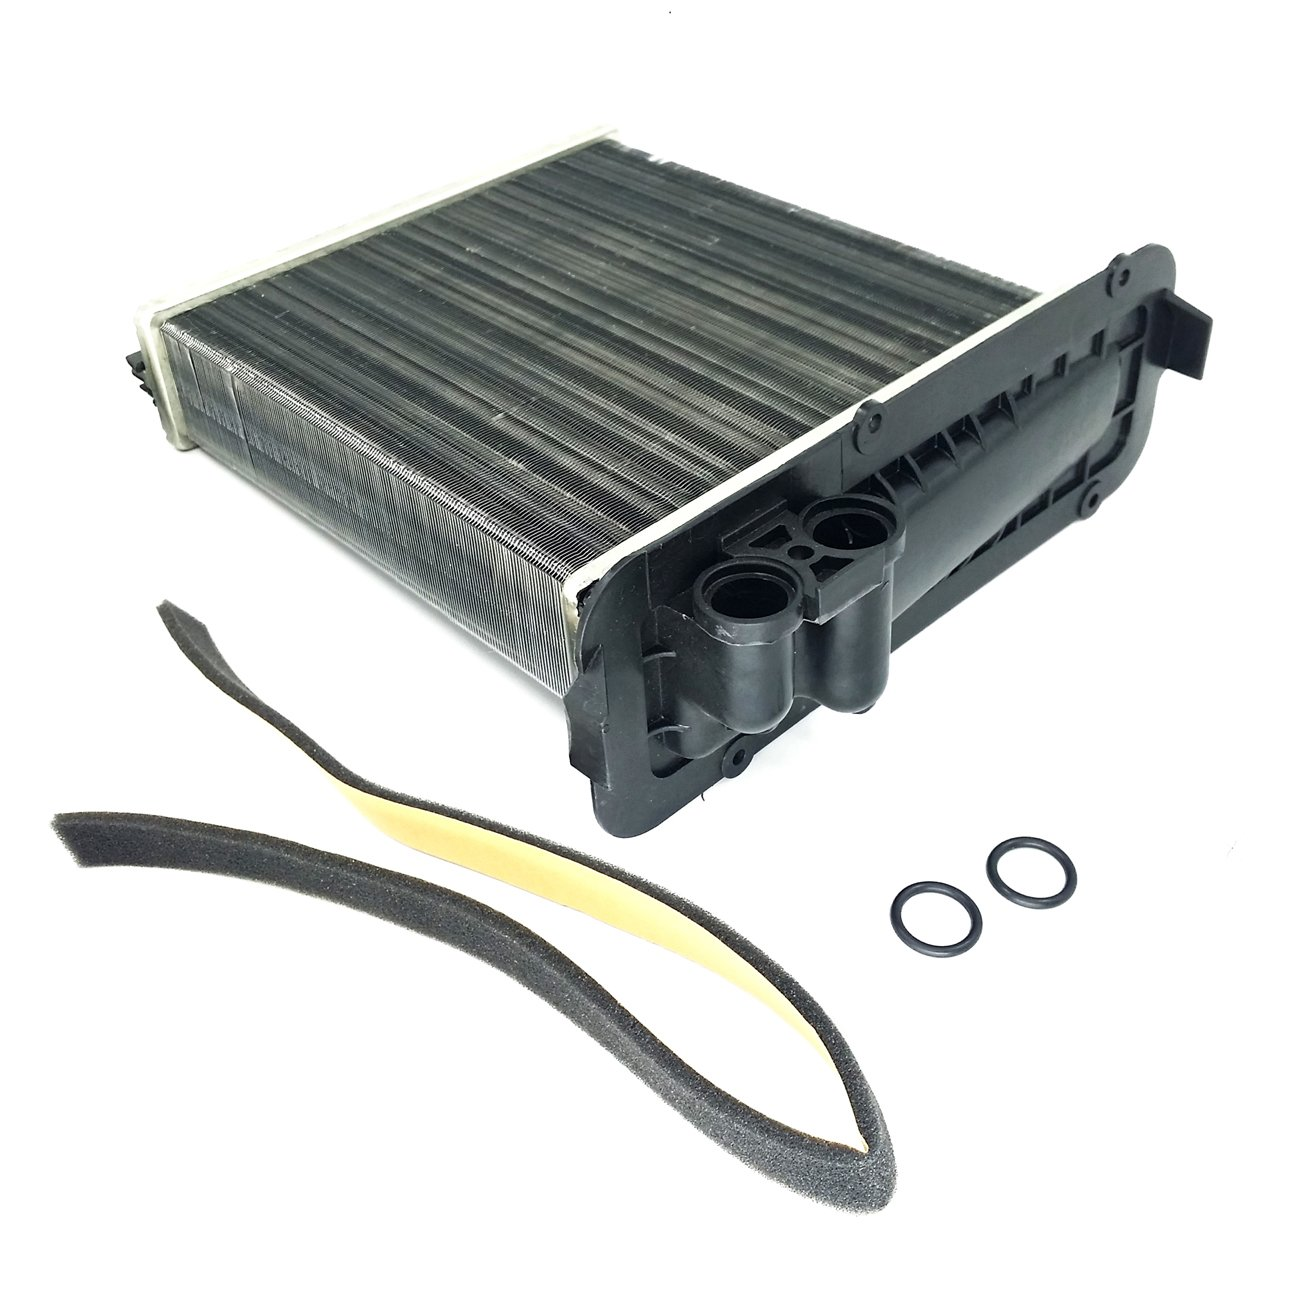 SKP SK73640 Heater Core, 1 Pack